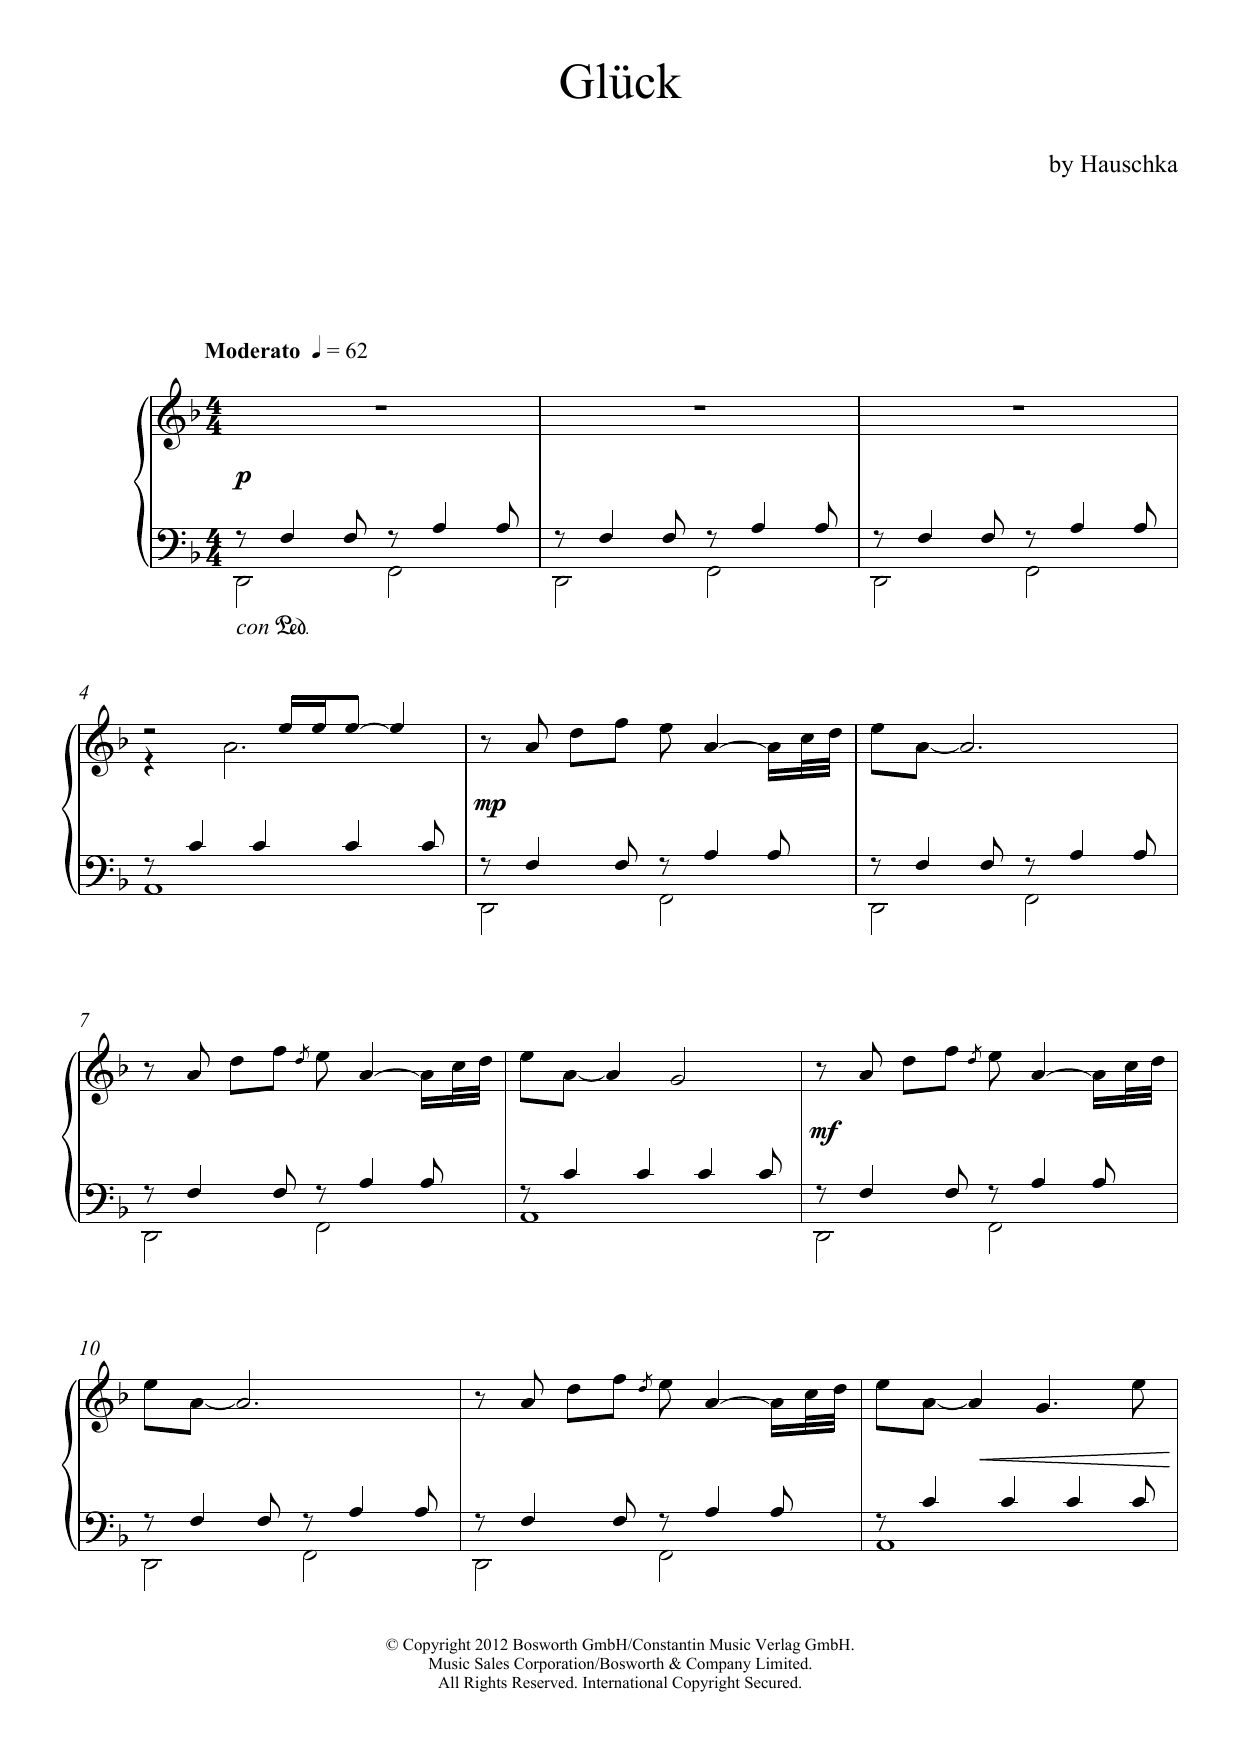 Hauschka - Gluck (Theme)